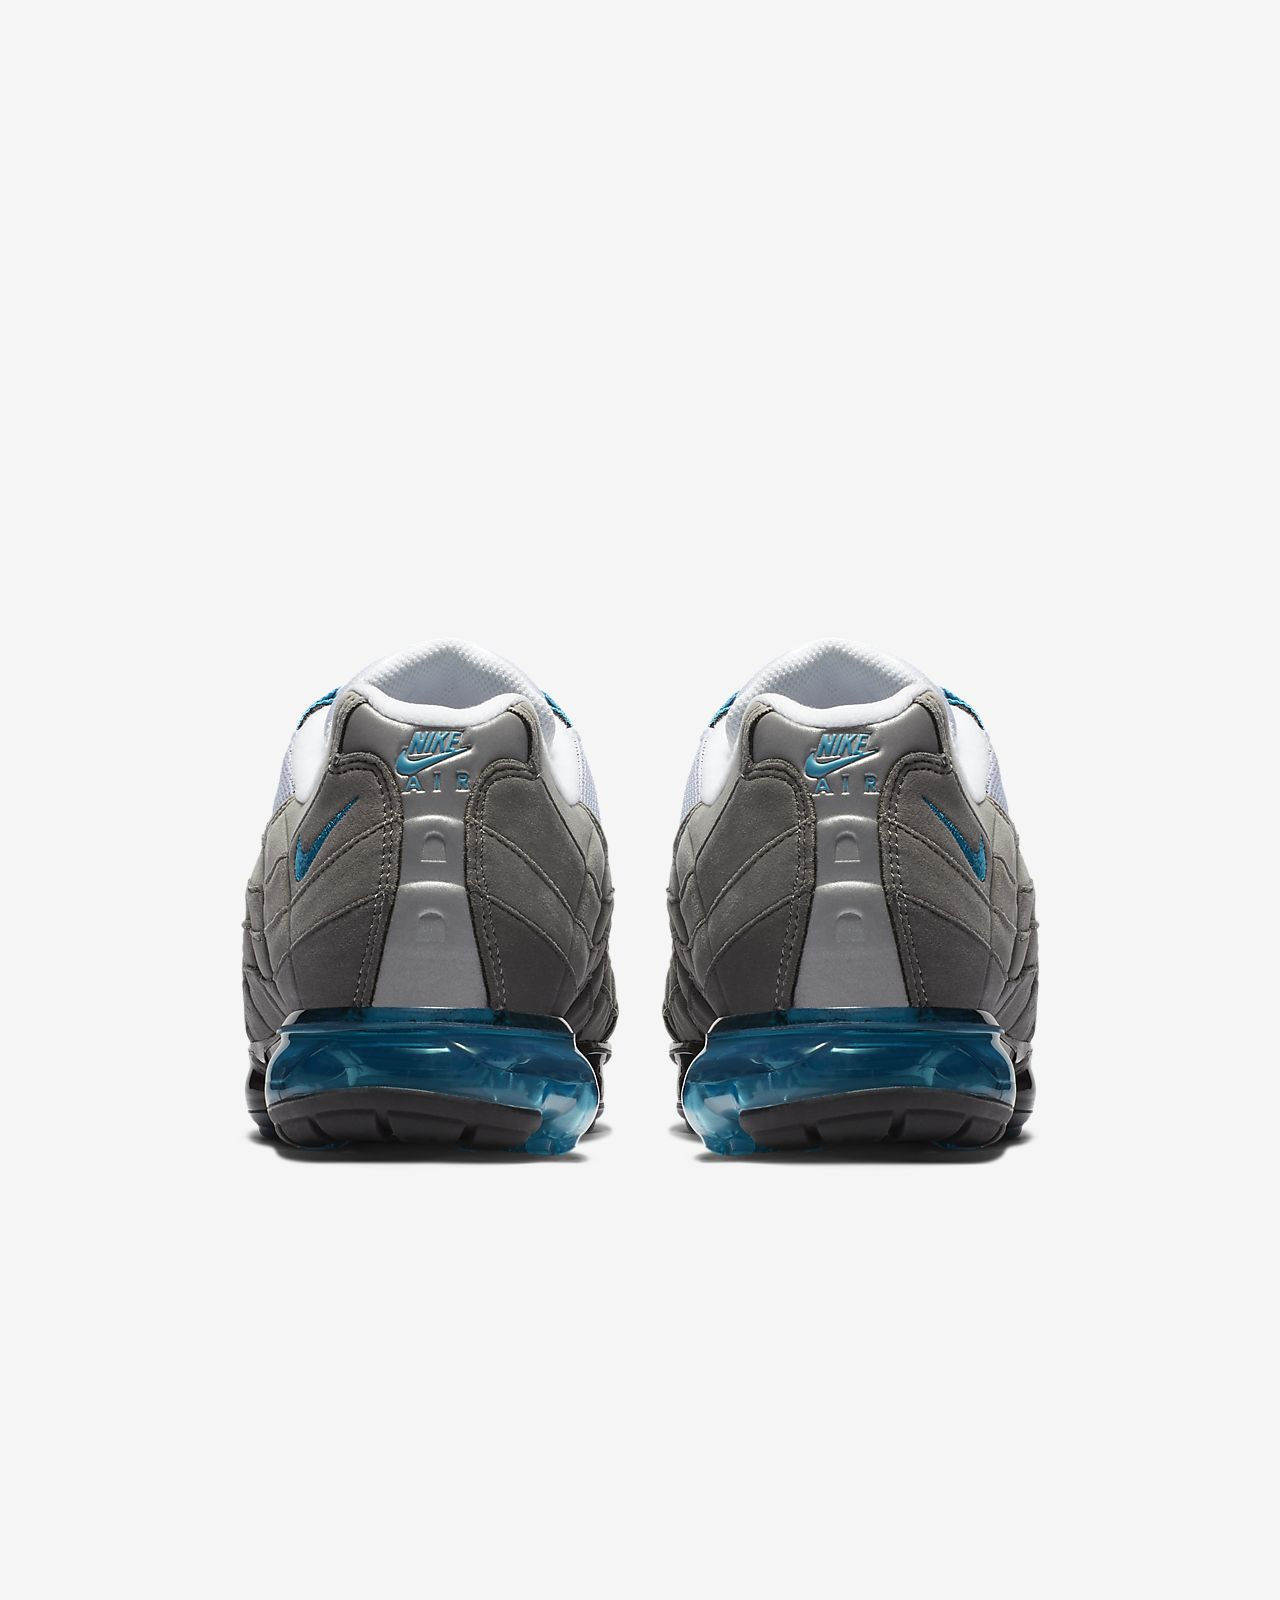 28f61b95c20 Nike Air VaporMax 95 Men s Shoe. Nike.com GB